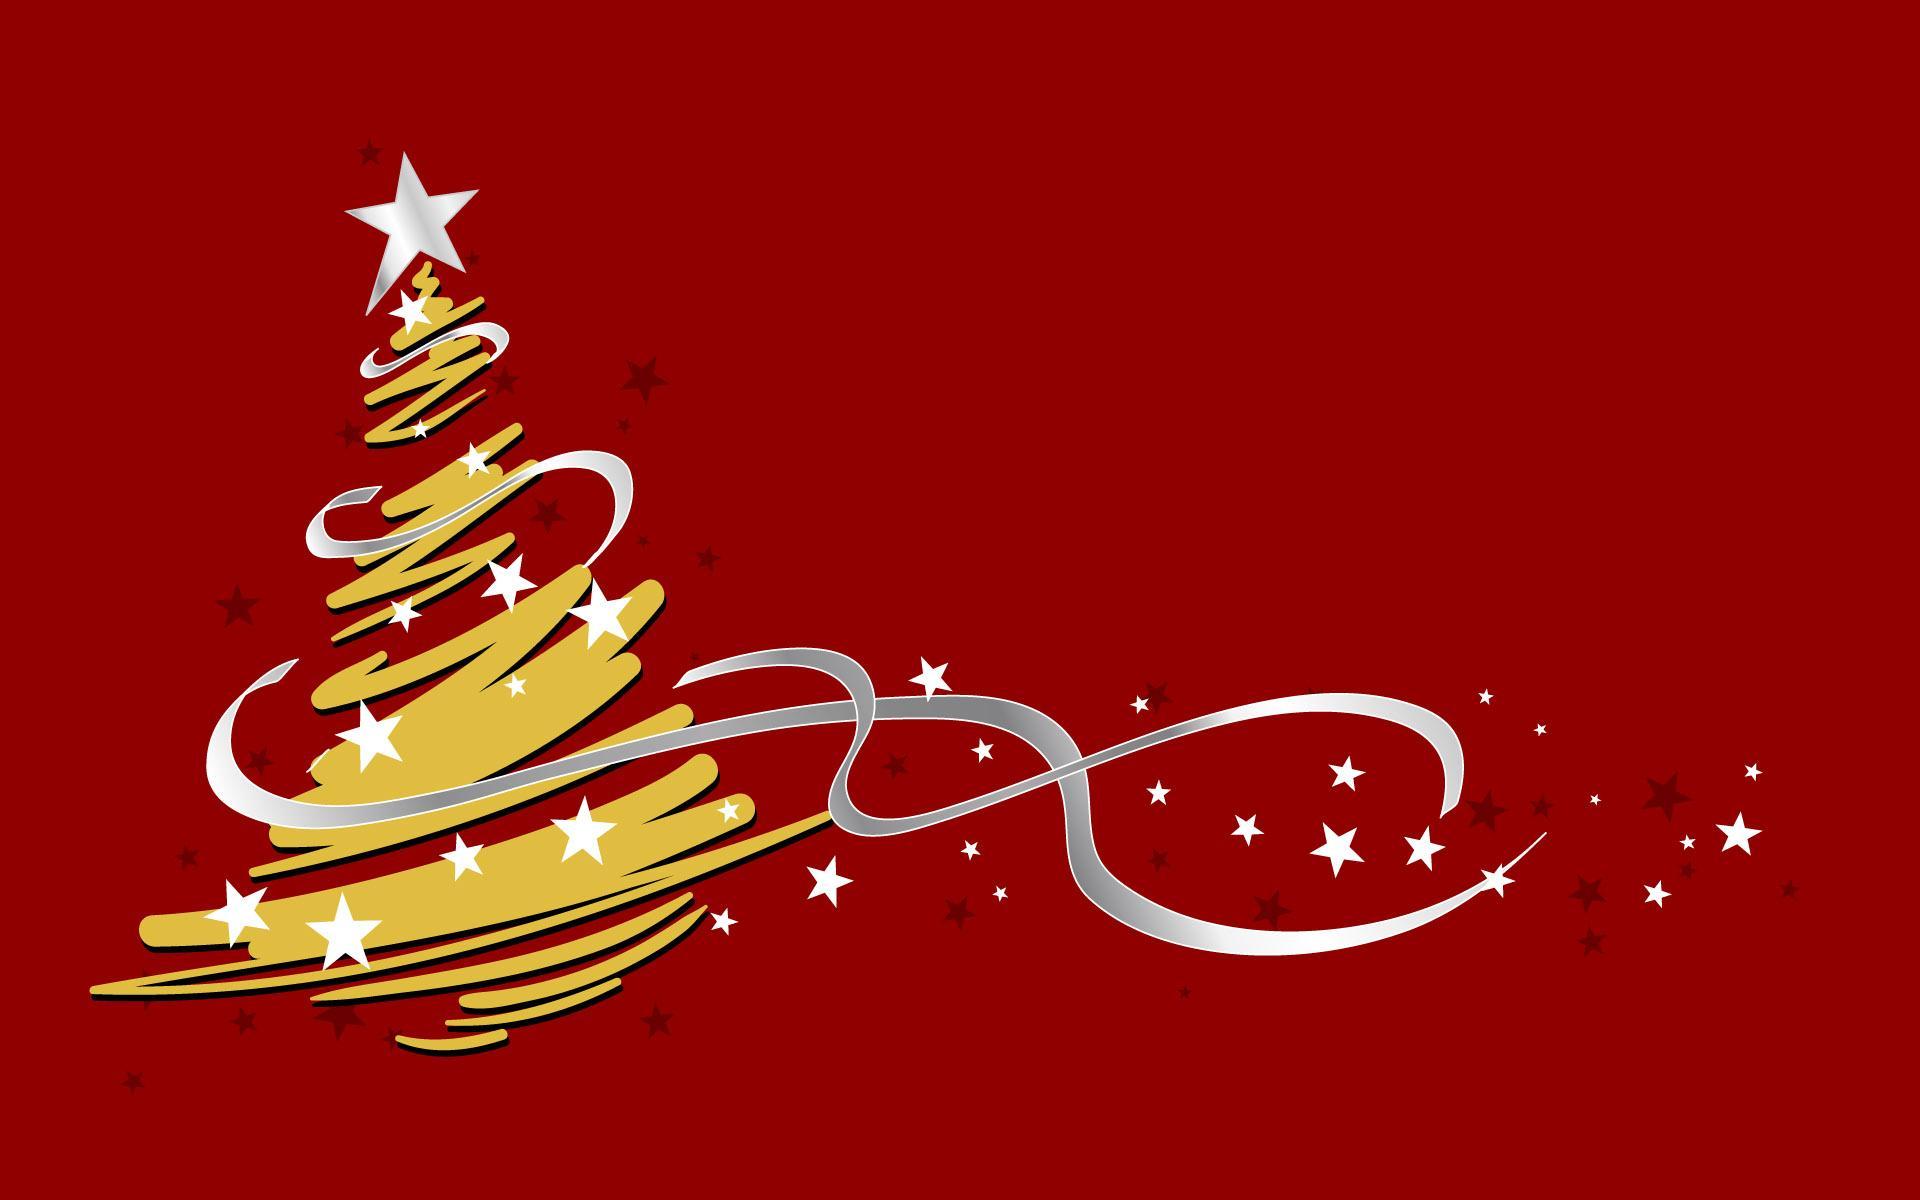 Fonds ecran noel for Natale immagini per desktop